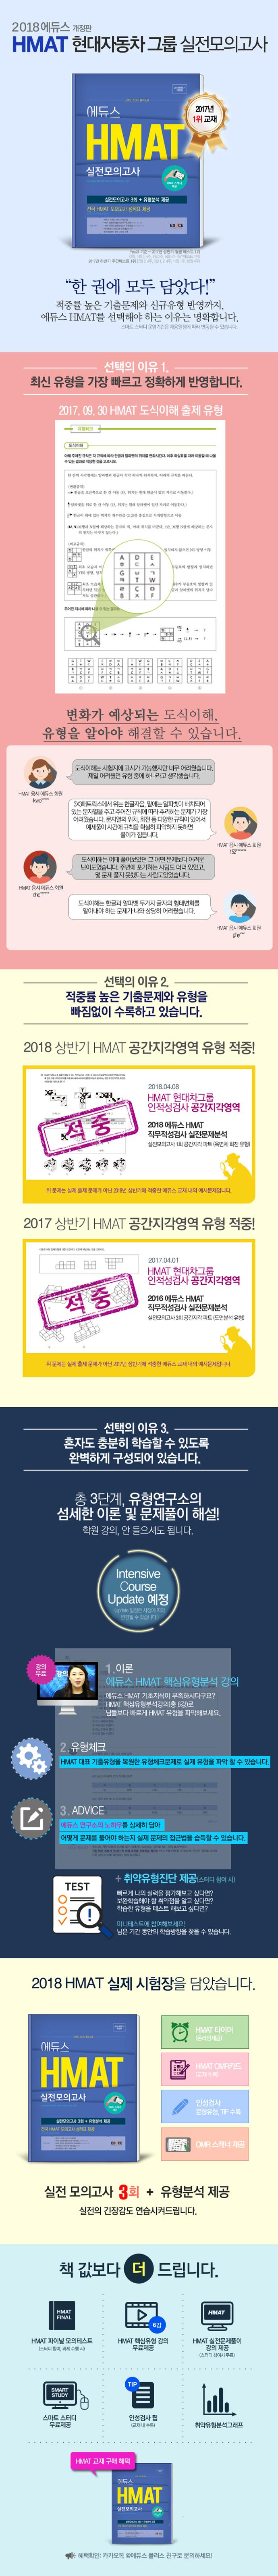 HMAT 실전모의고사(2018 하반기)(에듀스)(개정판) 도서 상세이미지